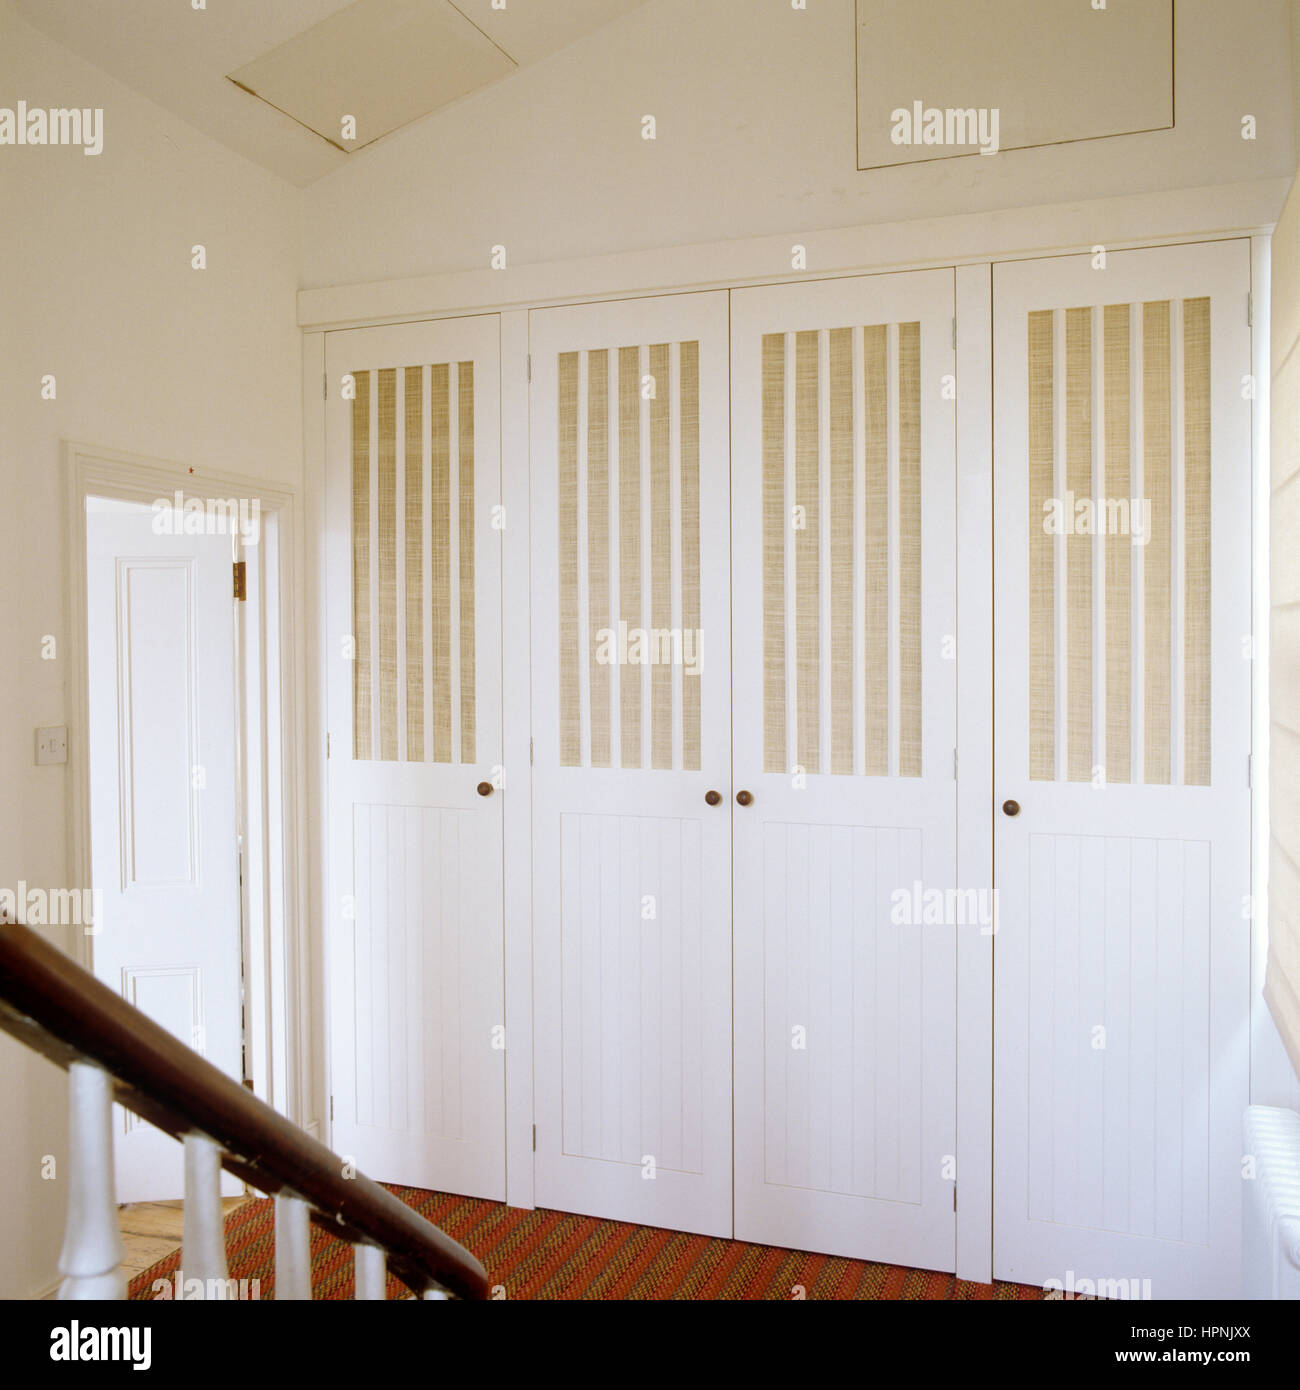 A closet by a railing. - Stock Image